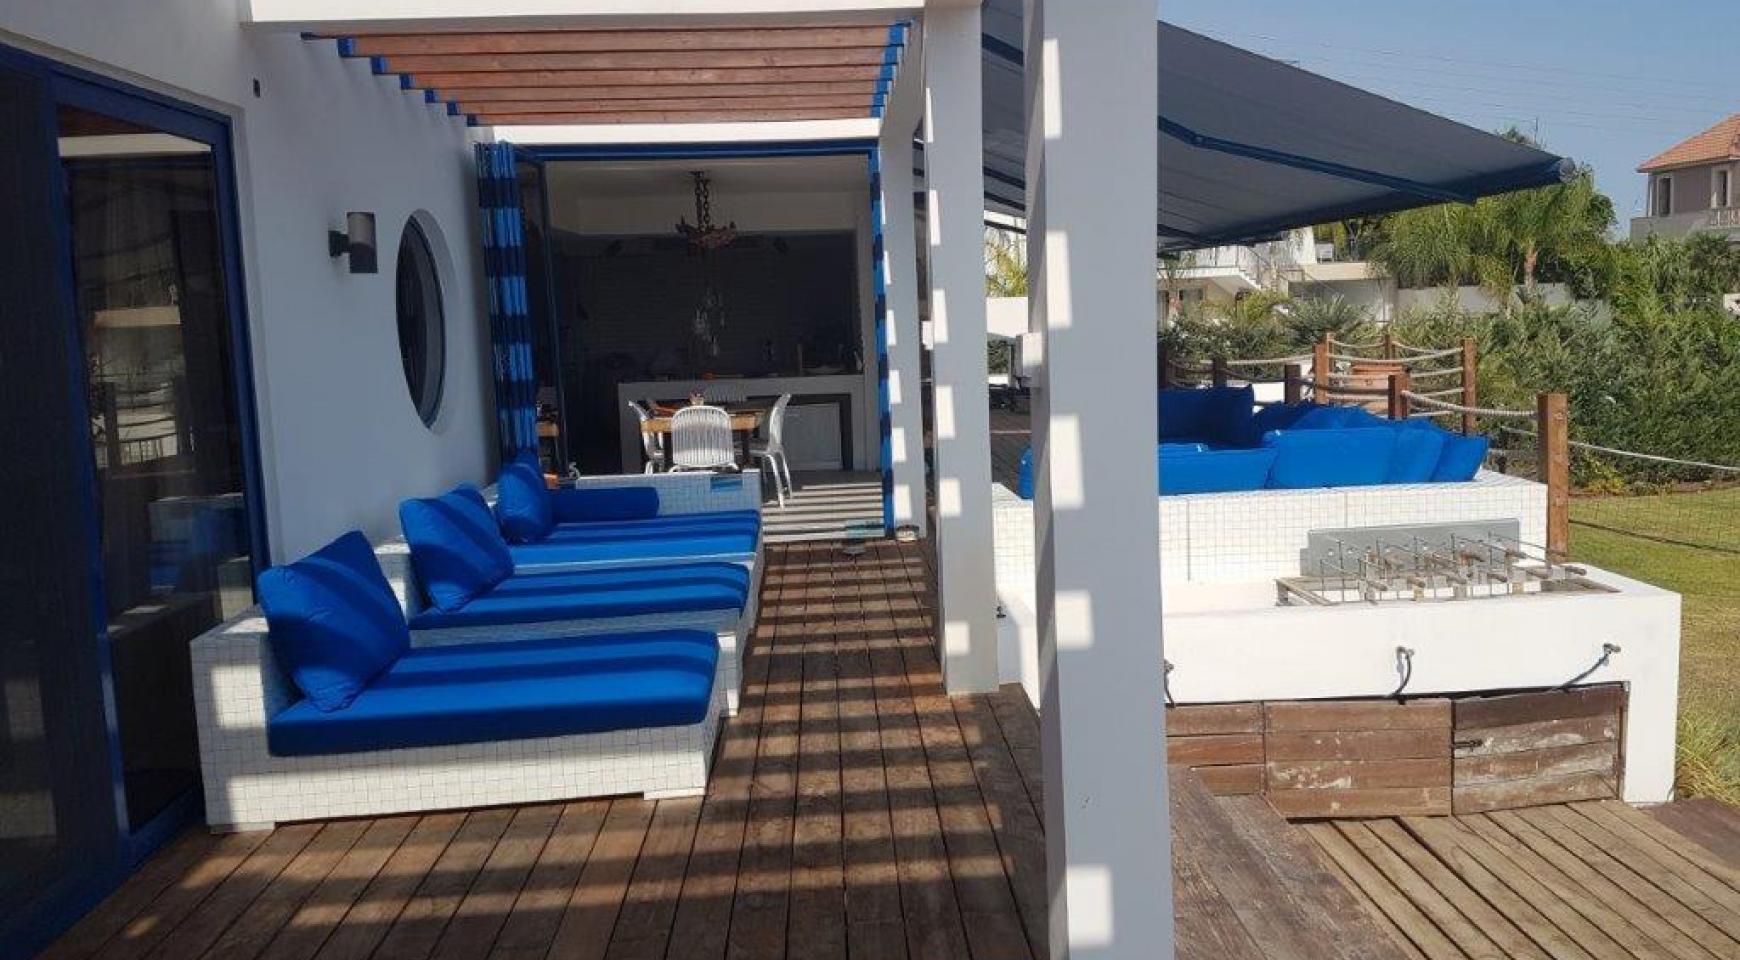 5-Спальная Вилла с видом на Море в районе  Agios Tychonas - 4